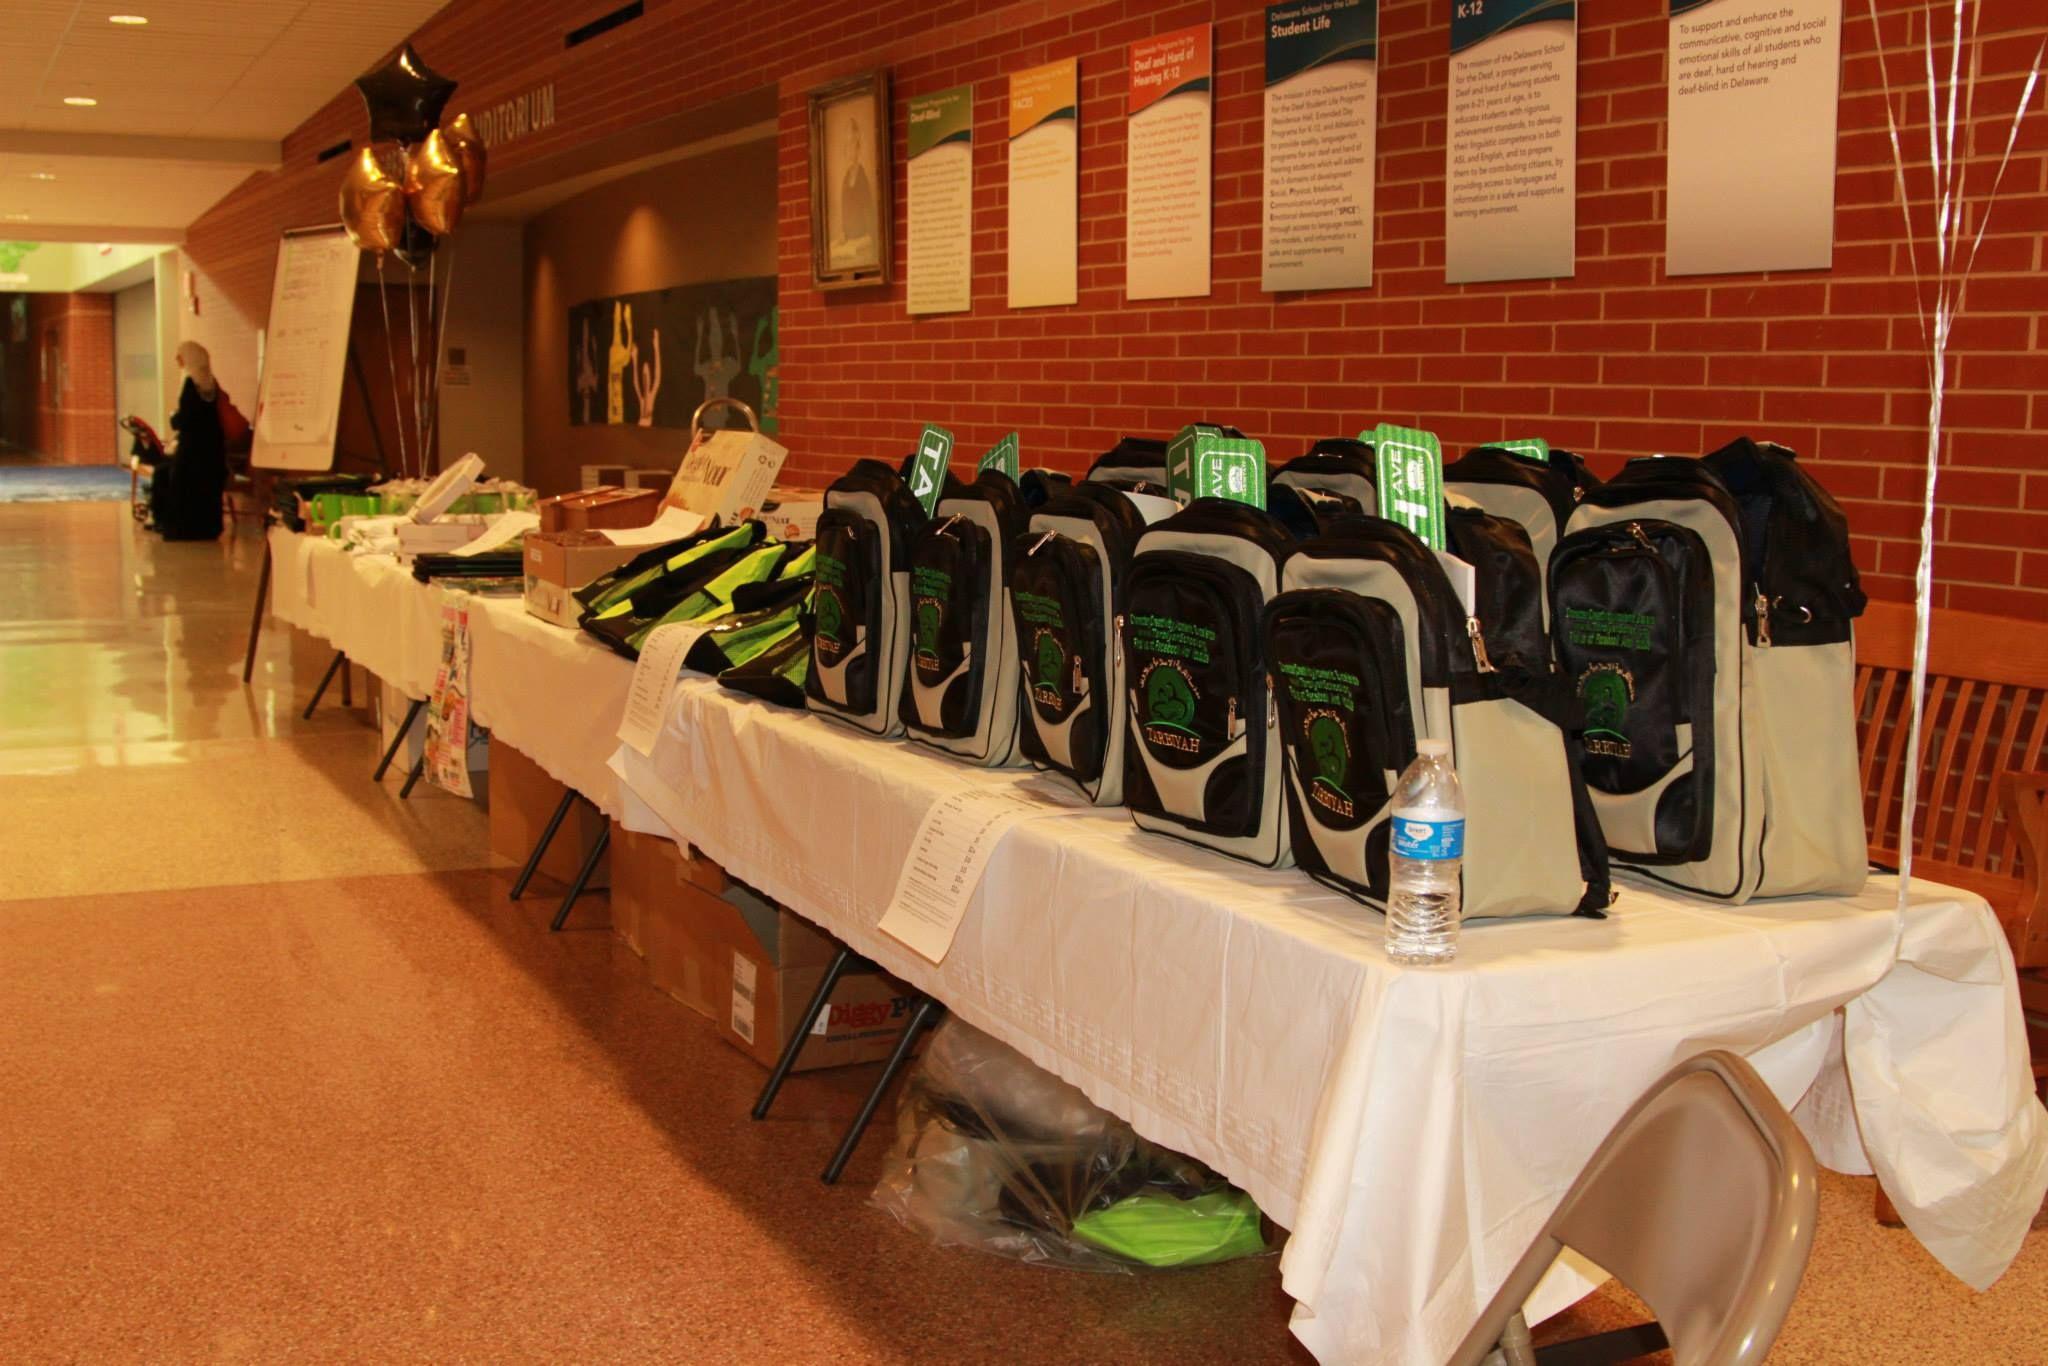 Tarbiyah School custom products on sale to raise money for school